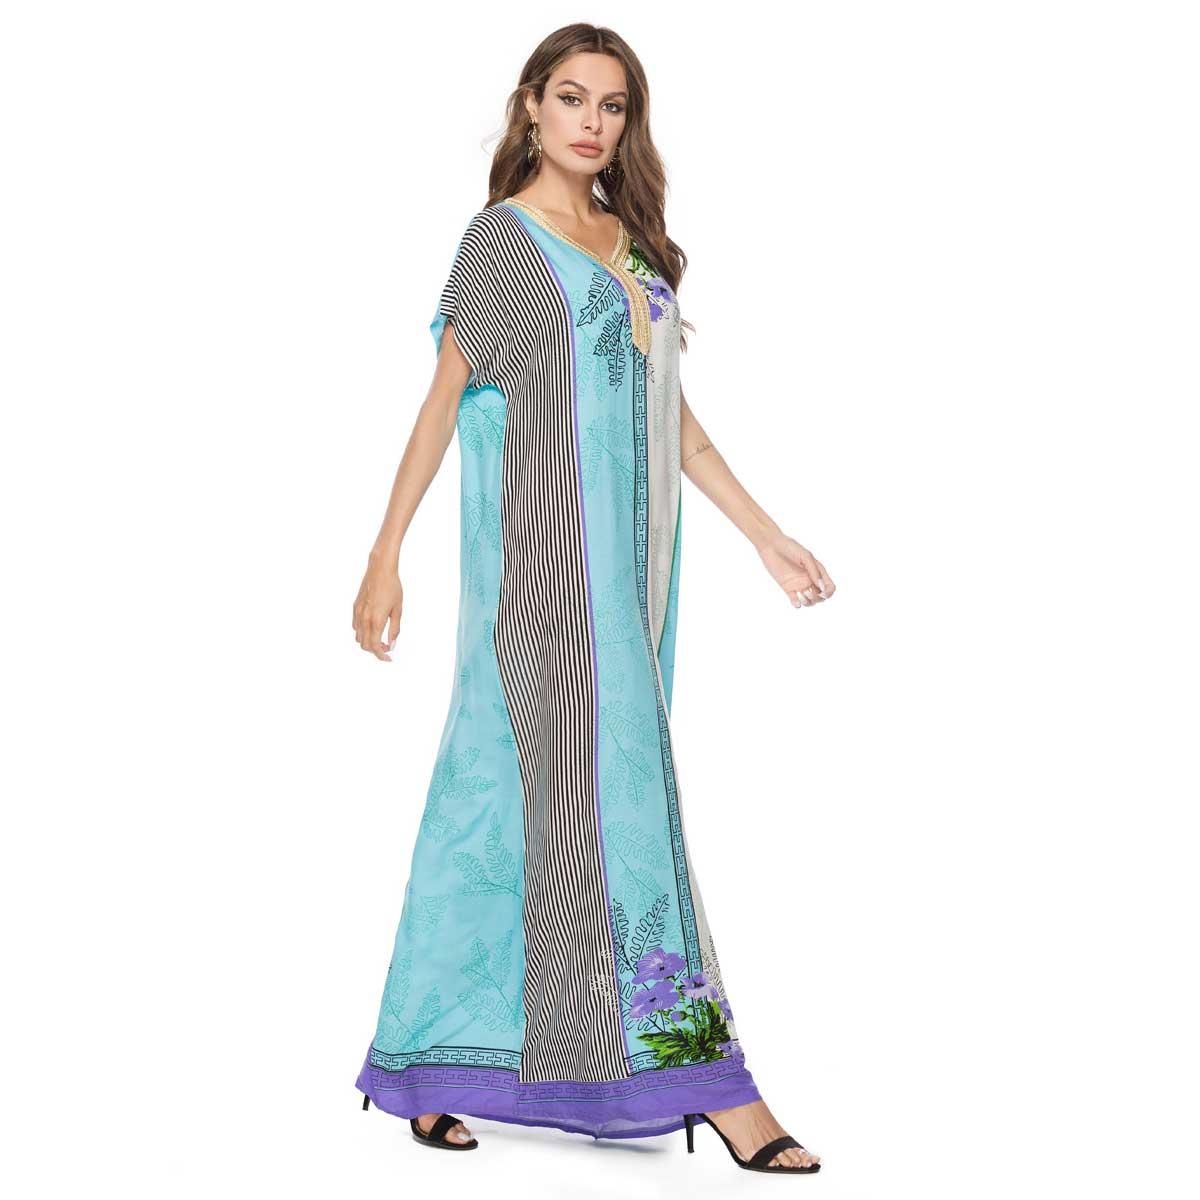 03098c46feb8f US $19.99 25% OFF|2019 Summer Embroidery Patchwork Maxi Bohemian Dress  Short Sleeve Print Muslim Abaya Arab Islamic Dubai Robe Plus Size  VKDR1554-in ...